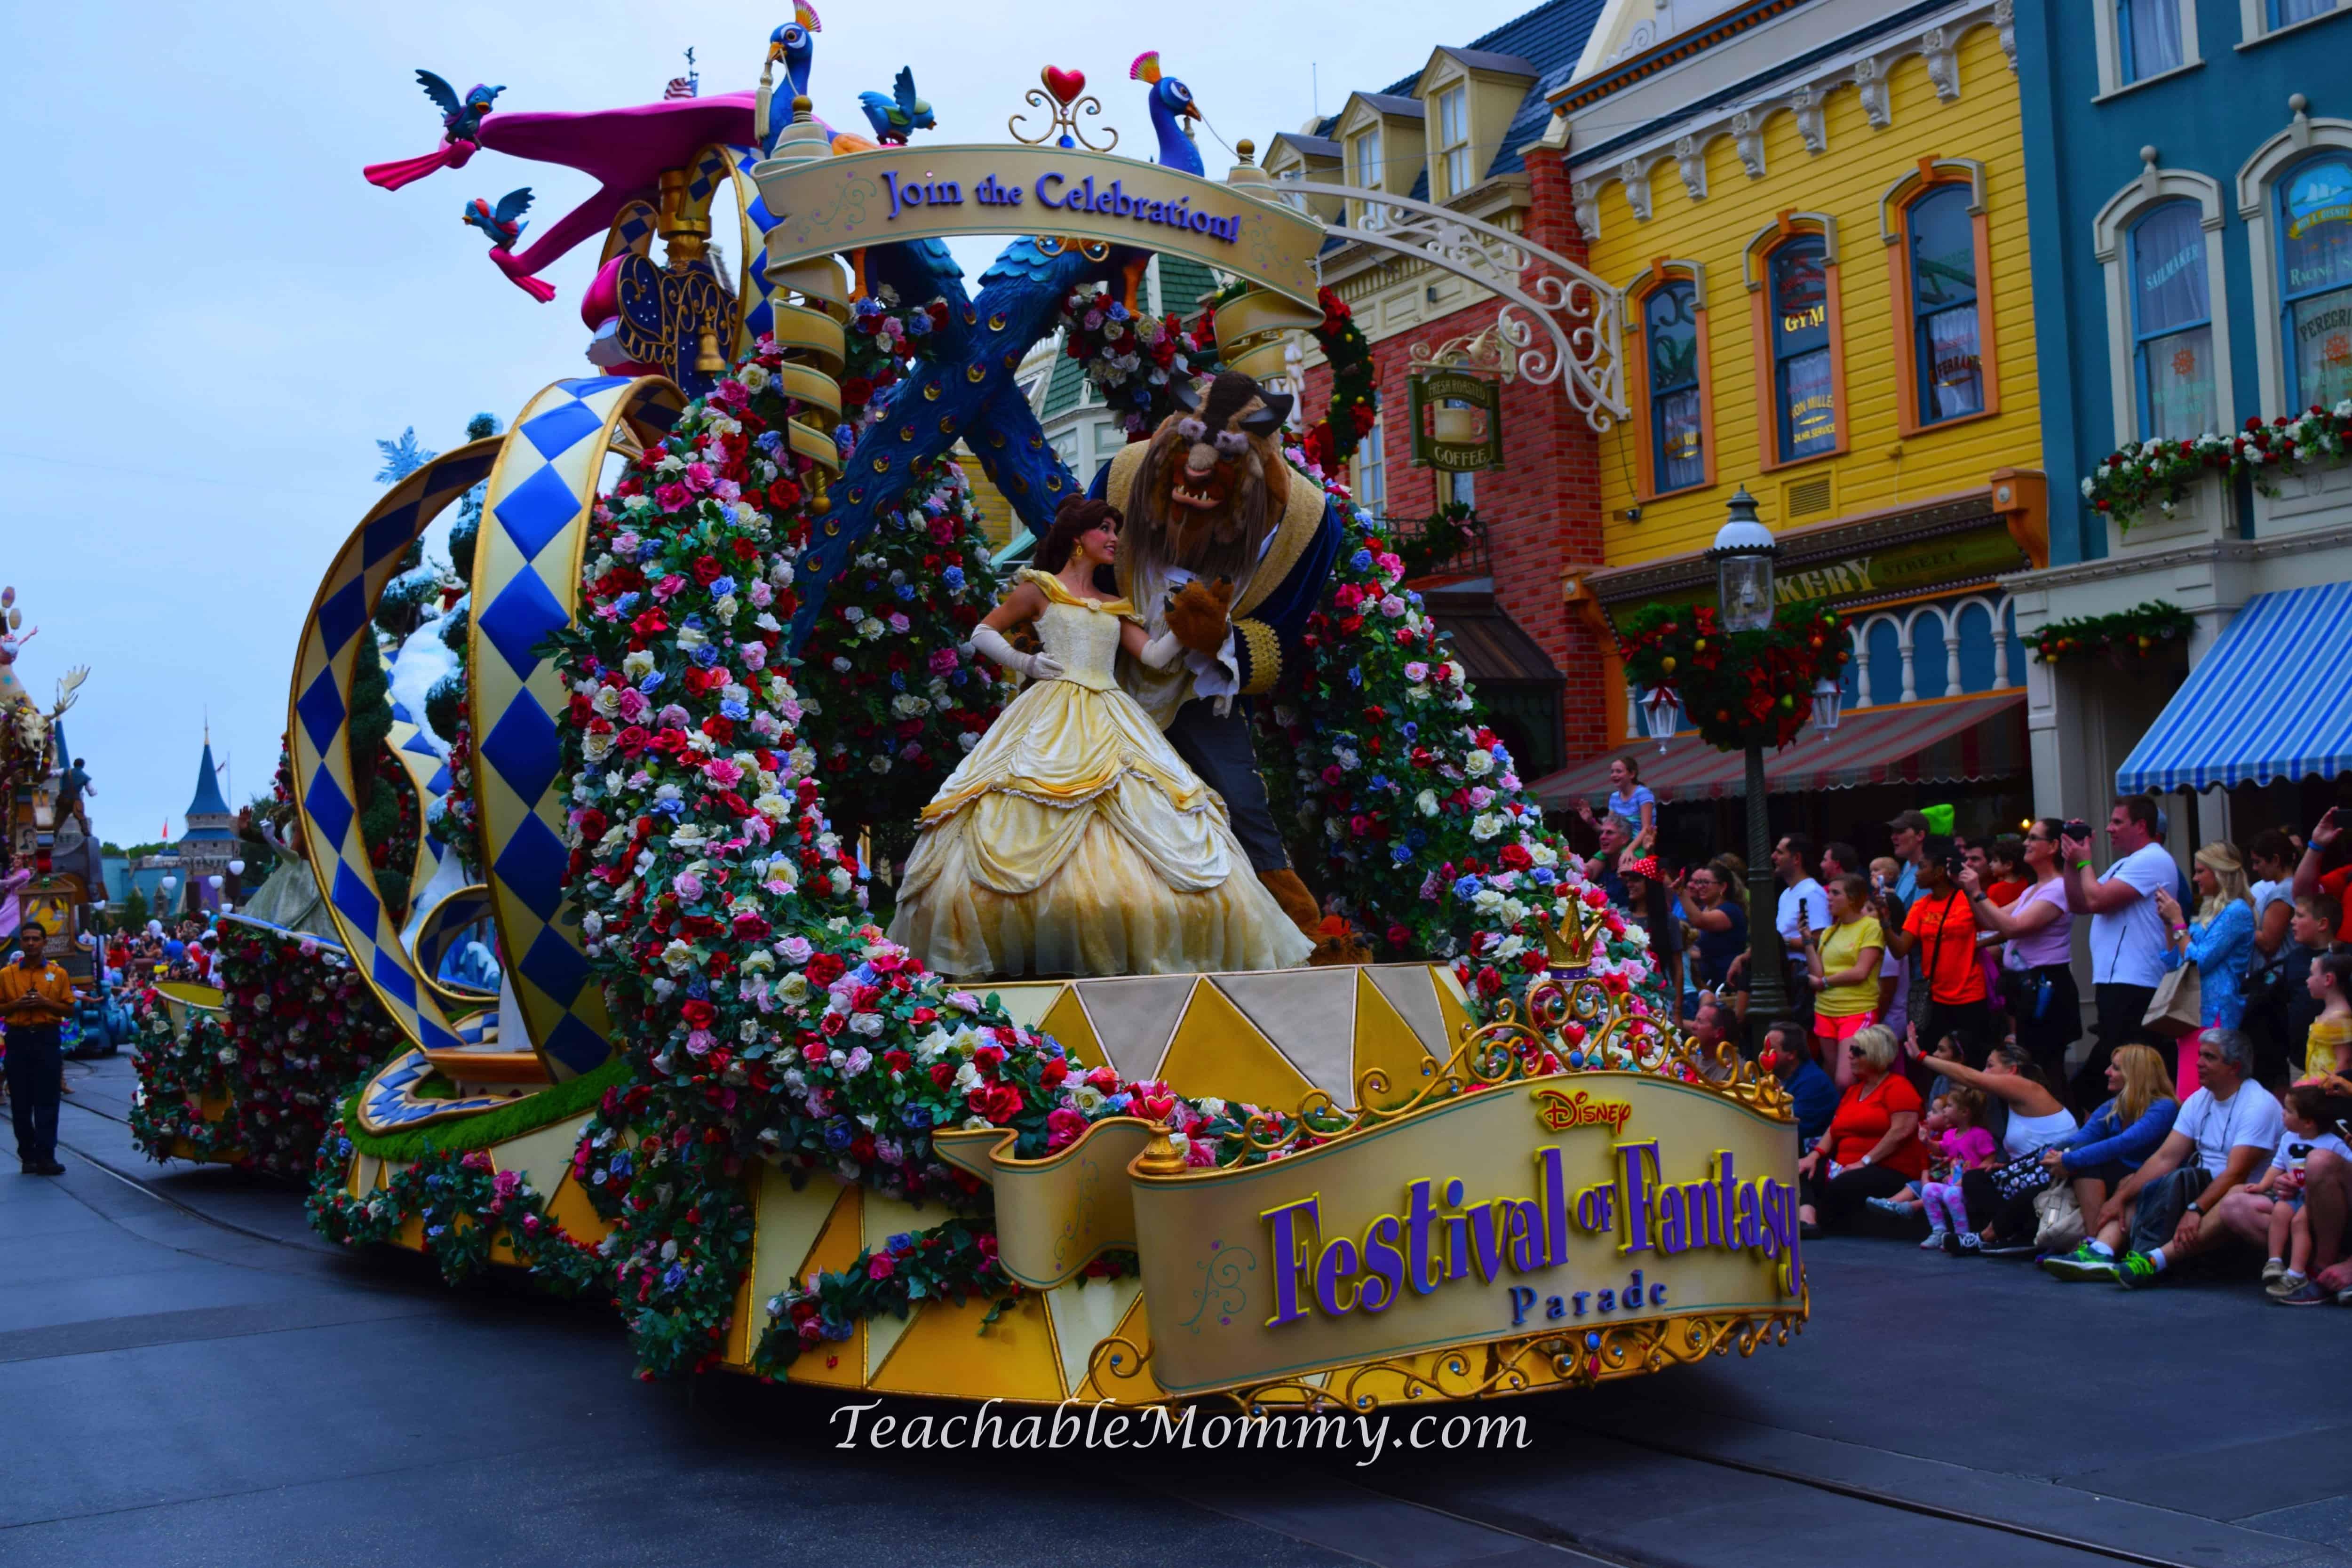 Fancy Dining Room Magic Kingdom Festival Of Fantasy Parade Teachable Mommy